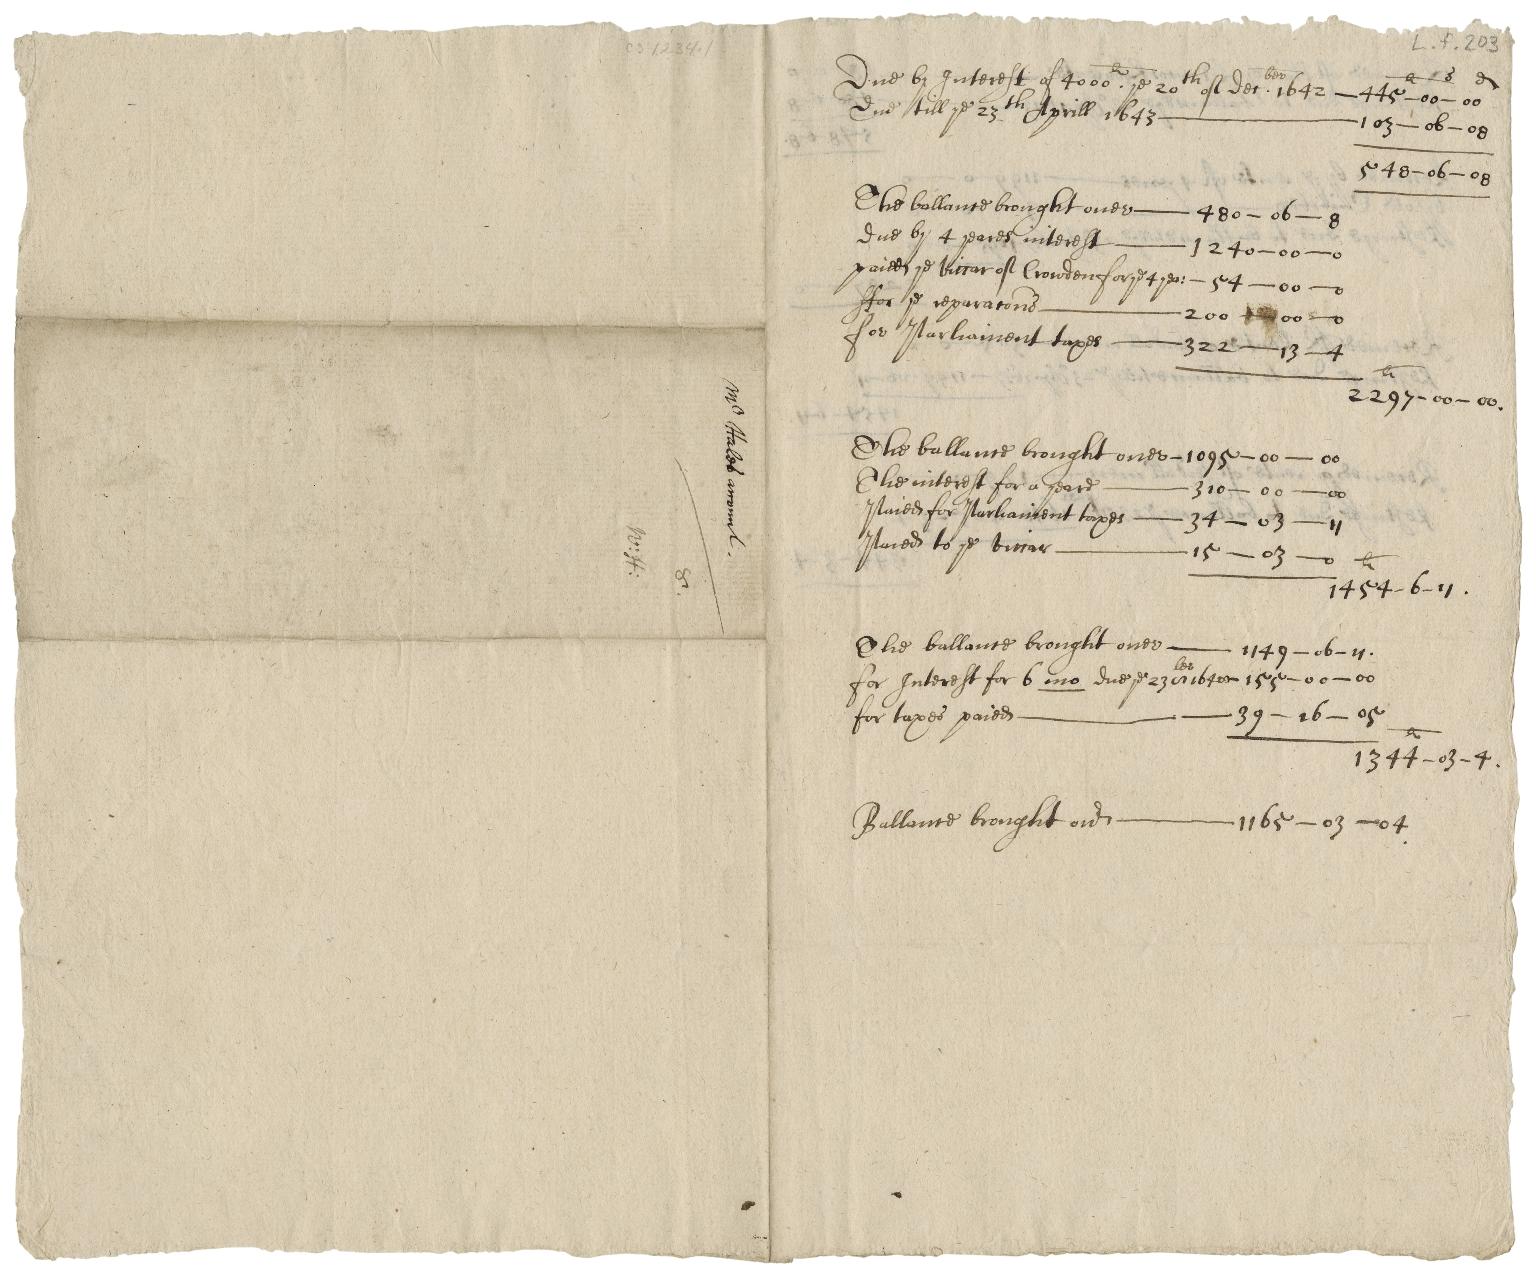 Accounts of William? Hale